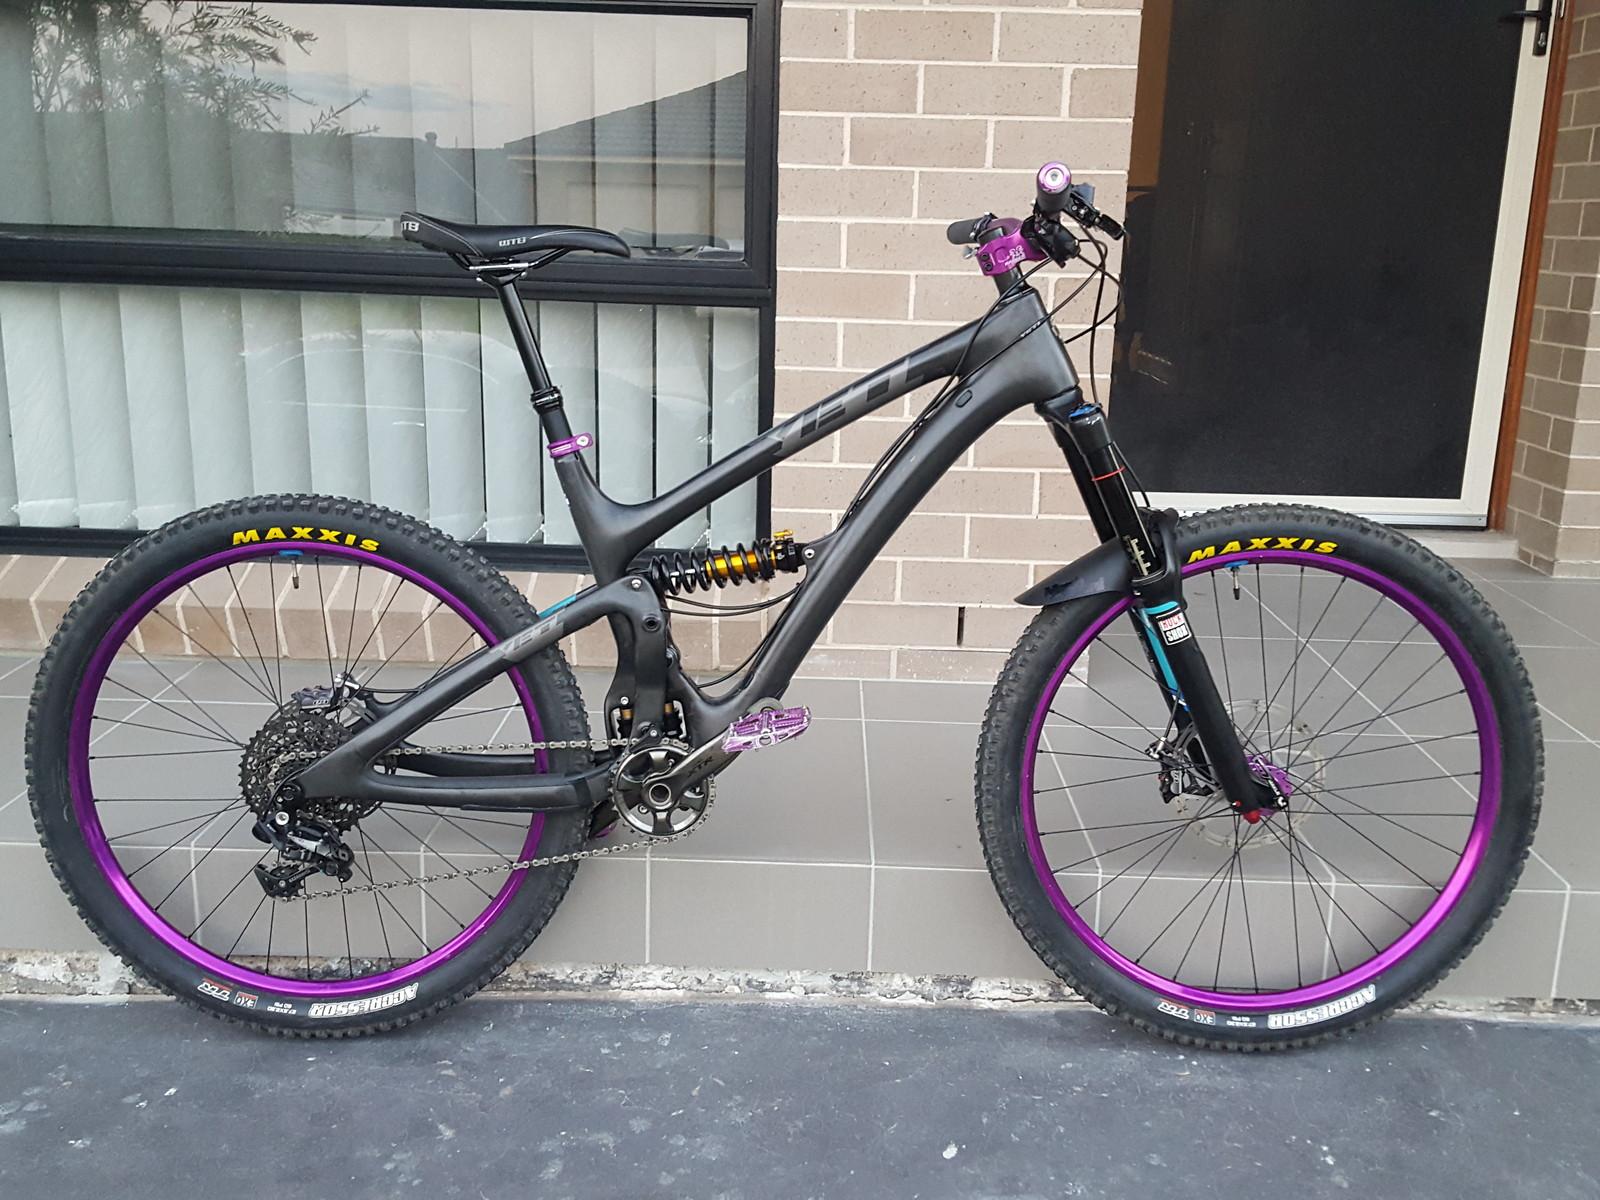 SB6C- The Big Purple Warrior